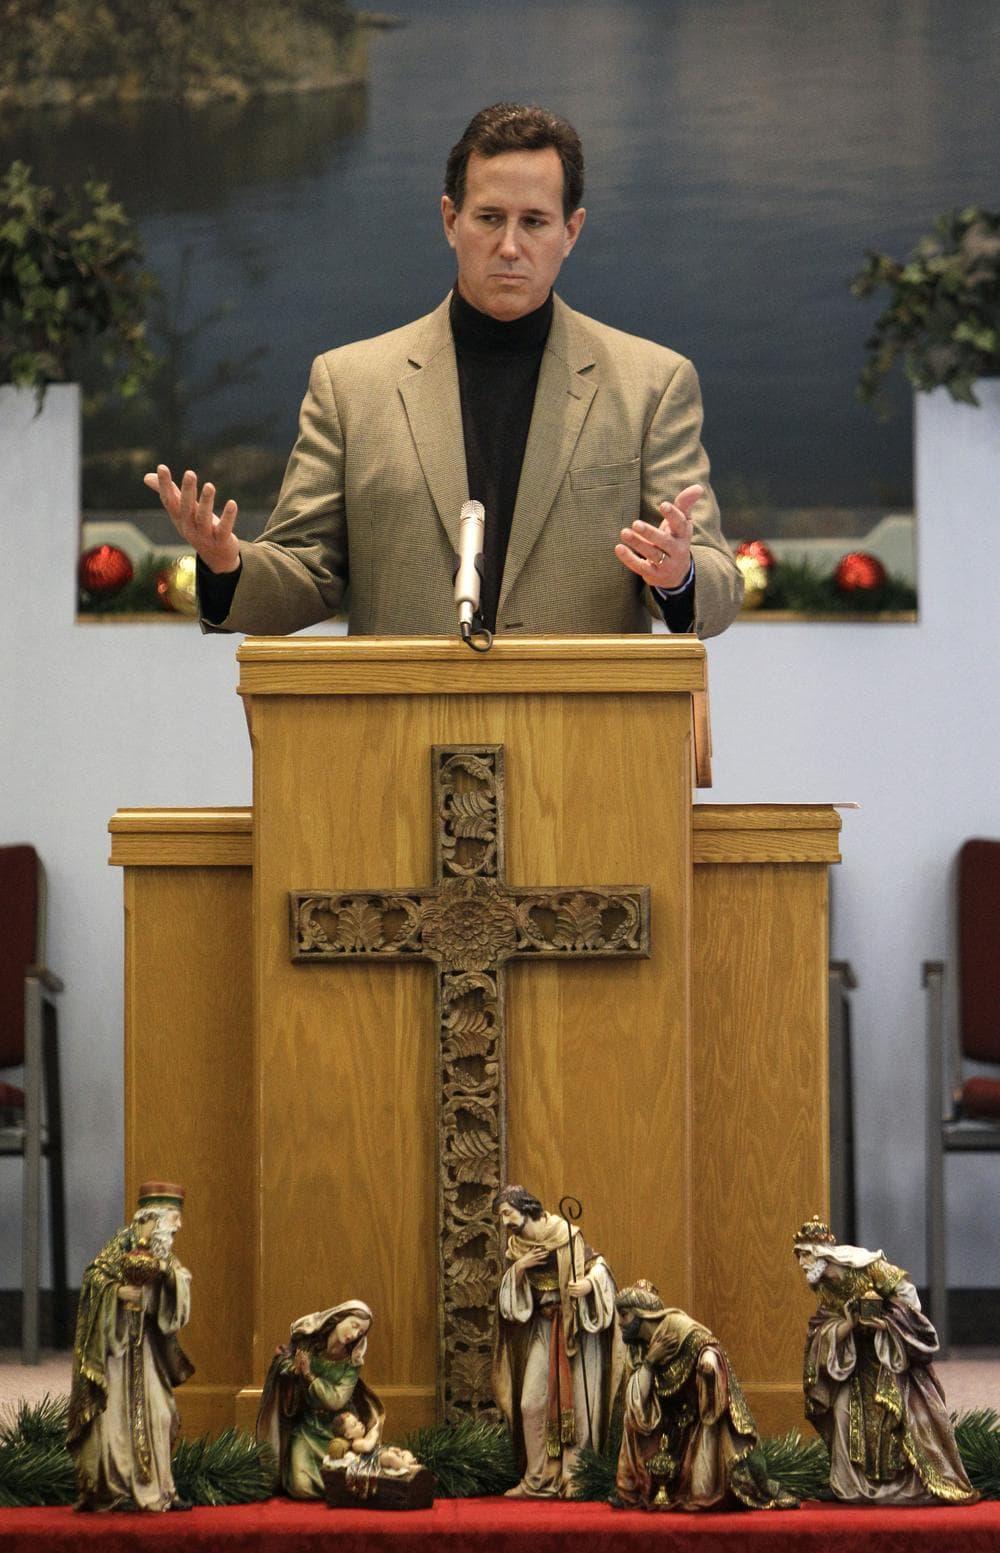 Republican presidential hopeful former Pennsylvania Senator Rick Santorum speaks at the Tabernacle Baptist Church, Sunday in Coralville, Iowa. (AP)